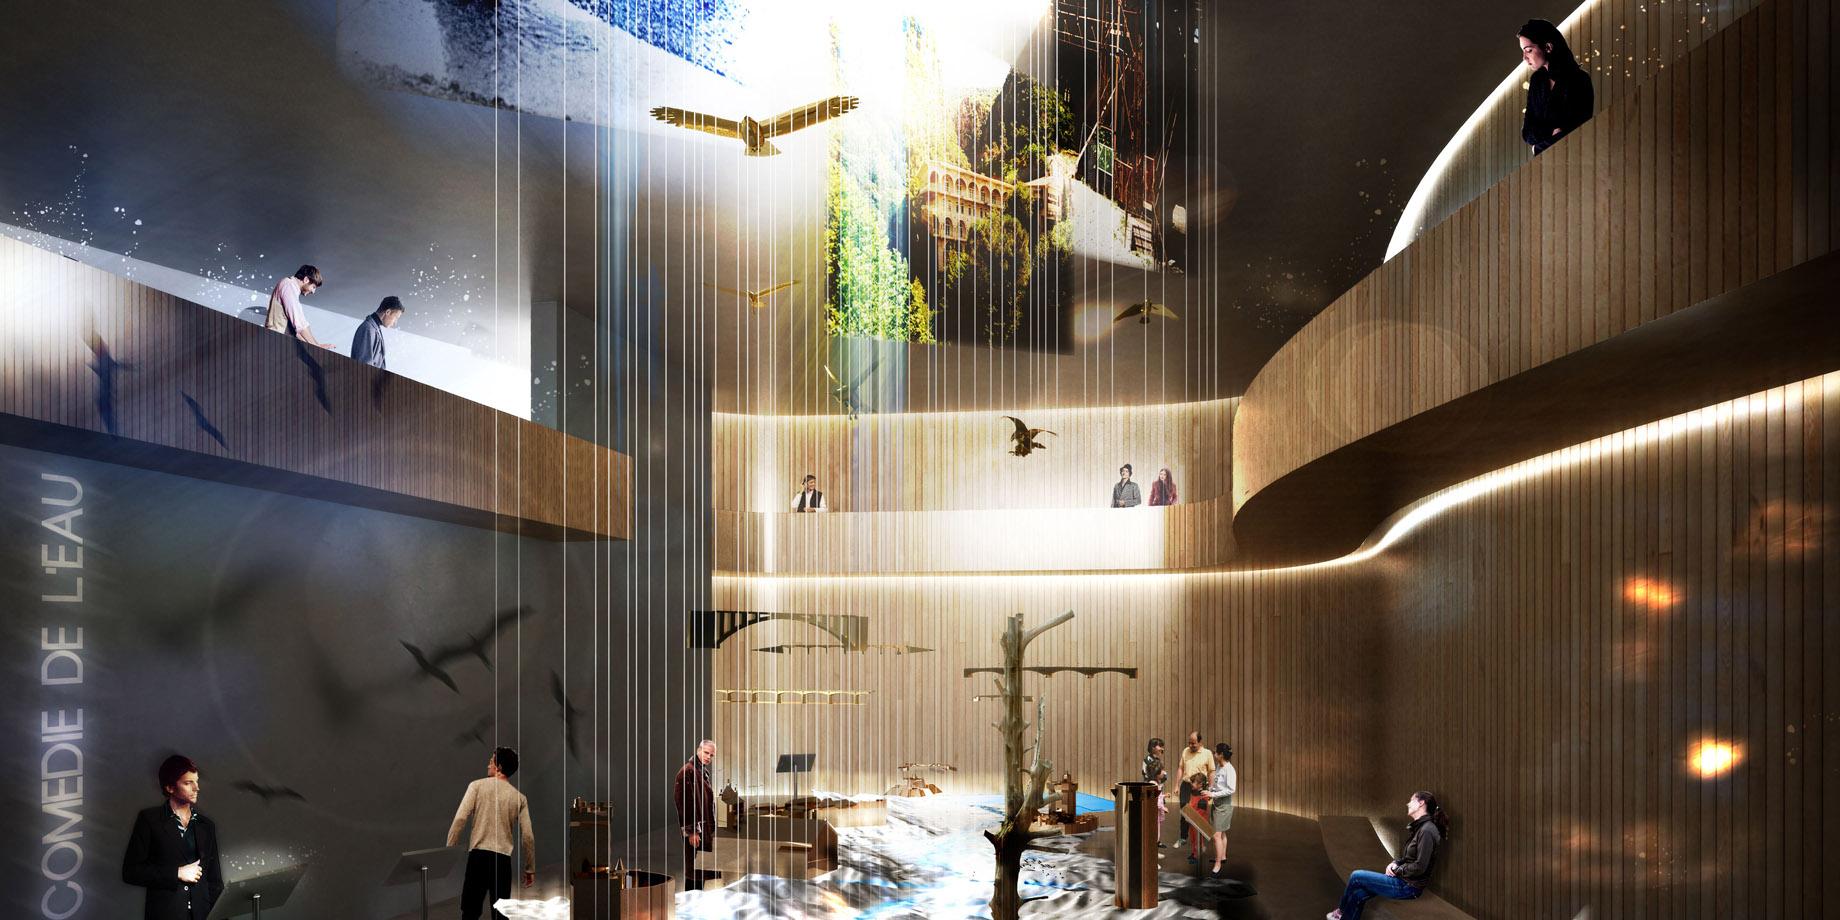 maskarade-architecture-scenographie-multimedia-transmedia-boulou-eau